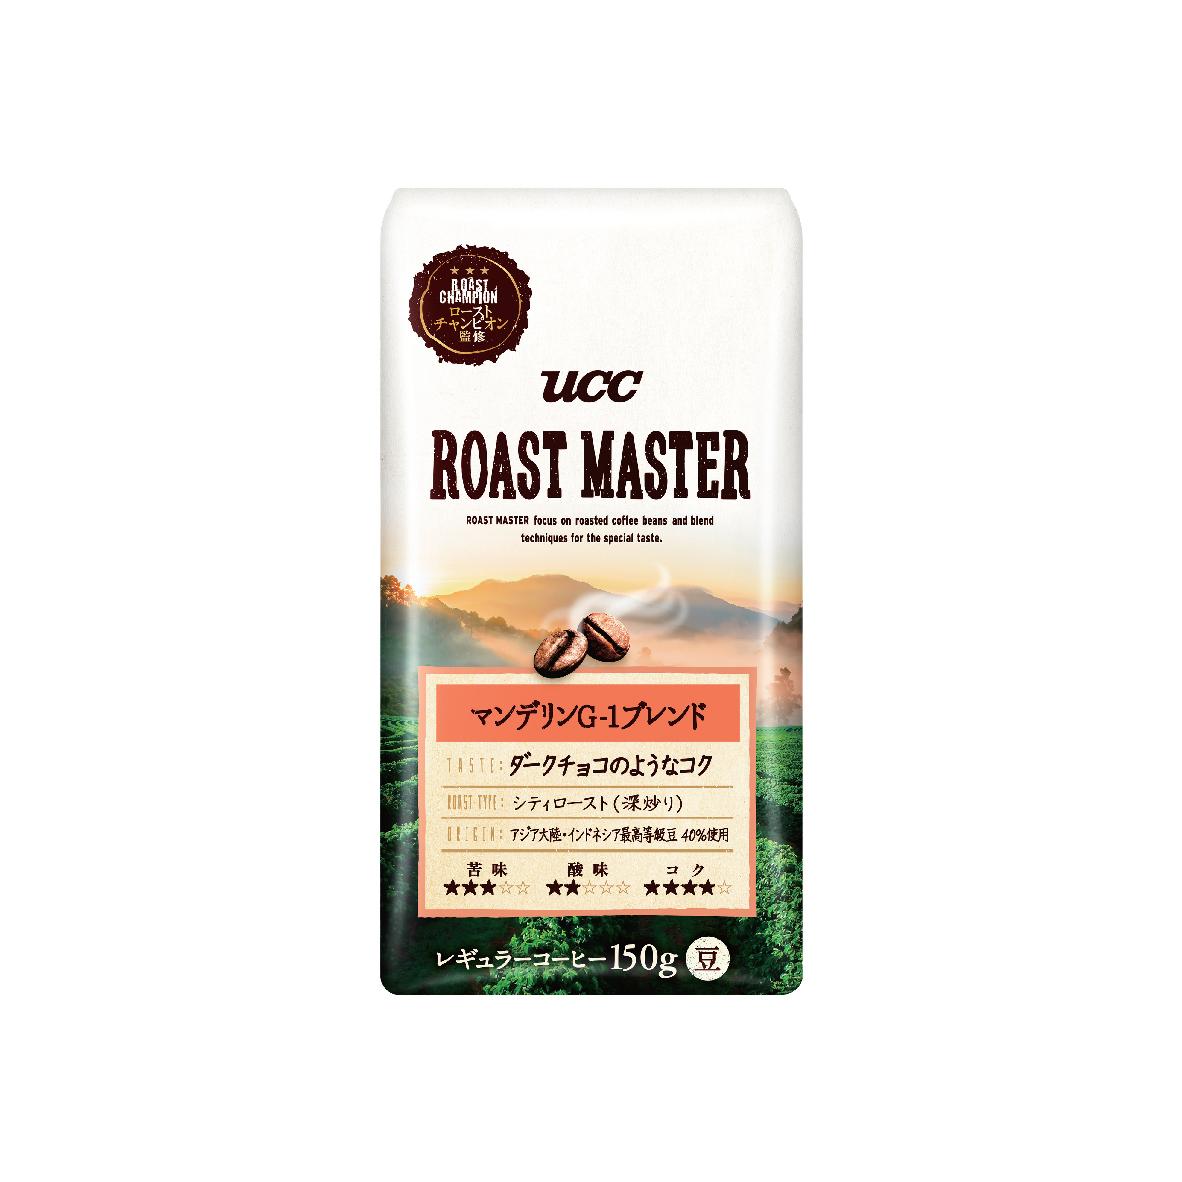 UCC Roast Master Mandolin G-1 Blend Roasted Coffee Beans